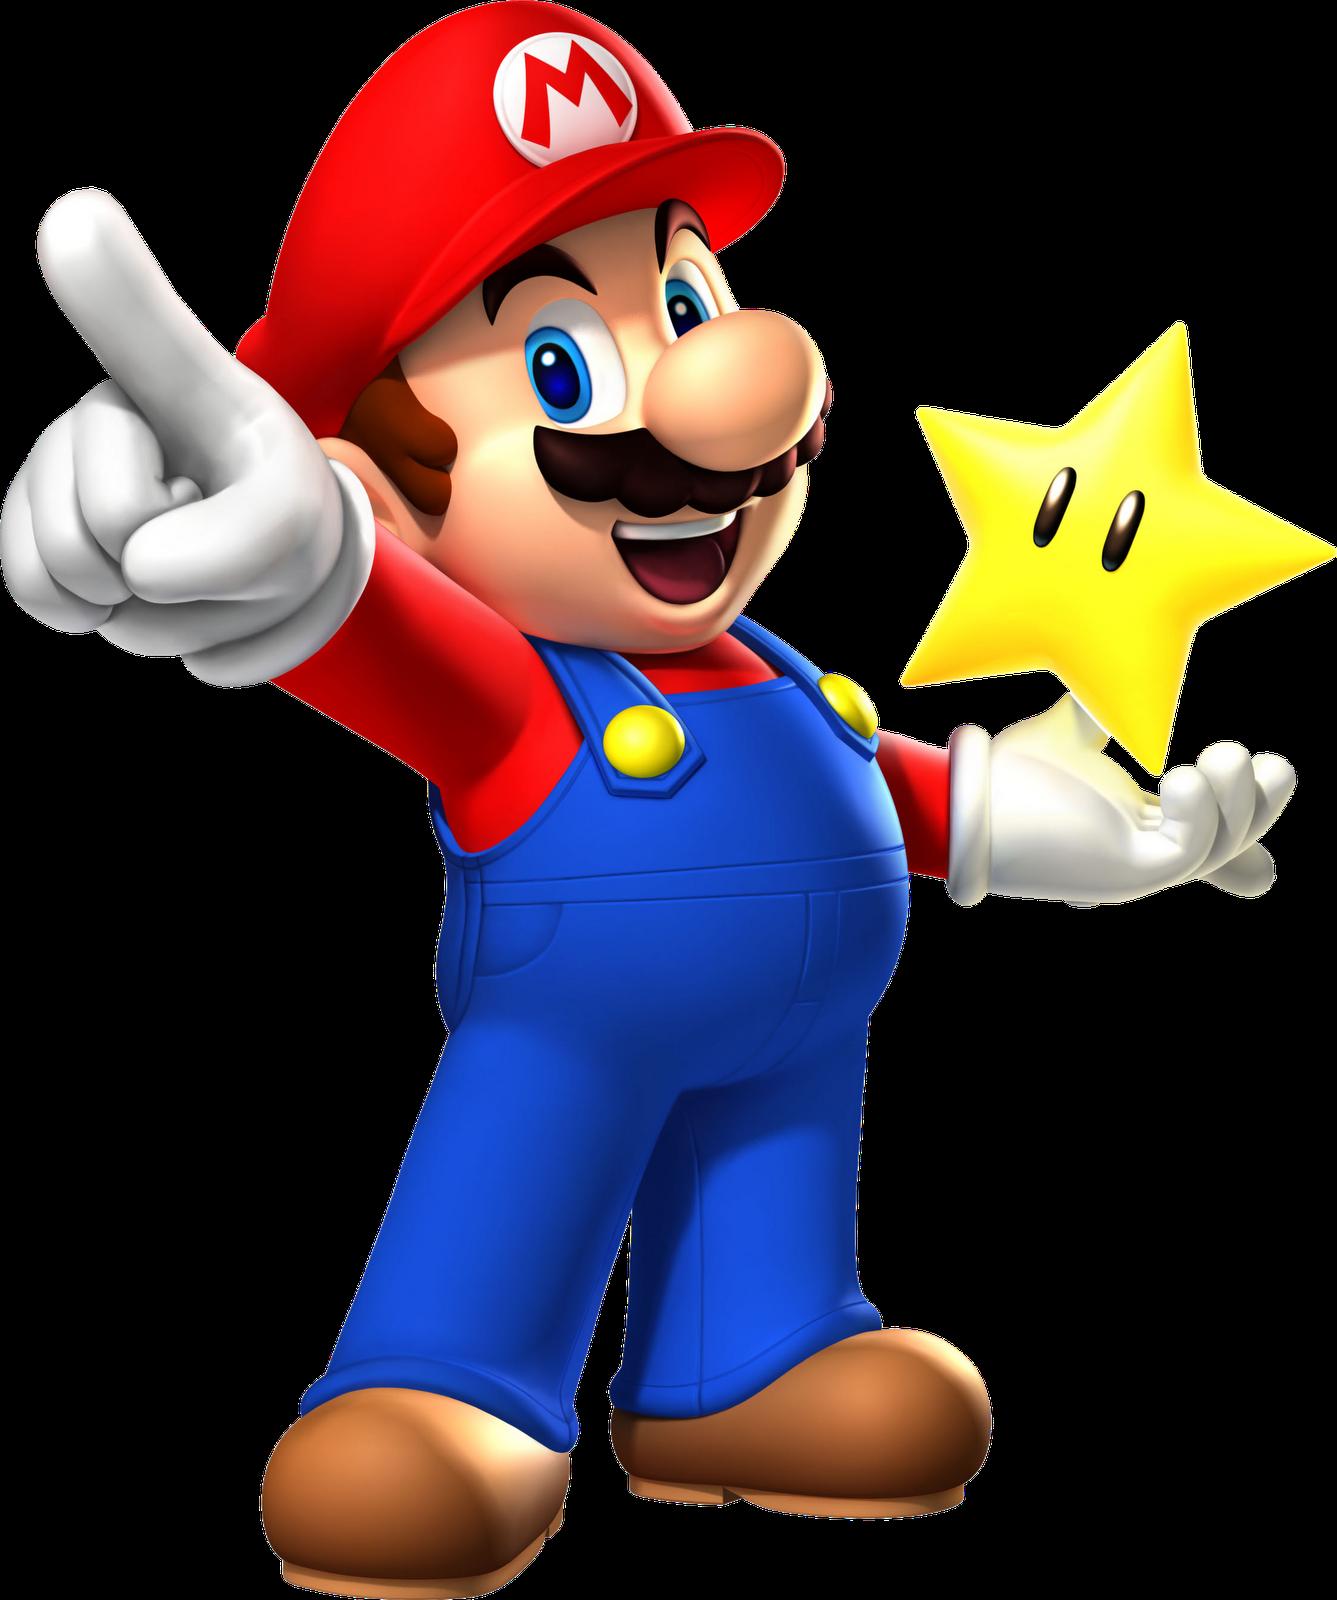 Mario Bros Png Images Super Mario Bros Clipart Download Free Transparent Png Logos